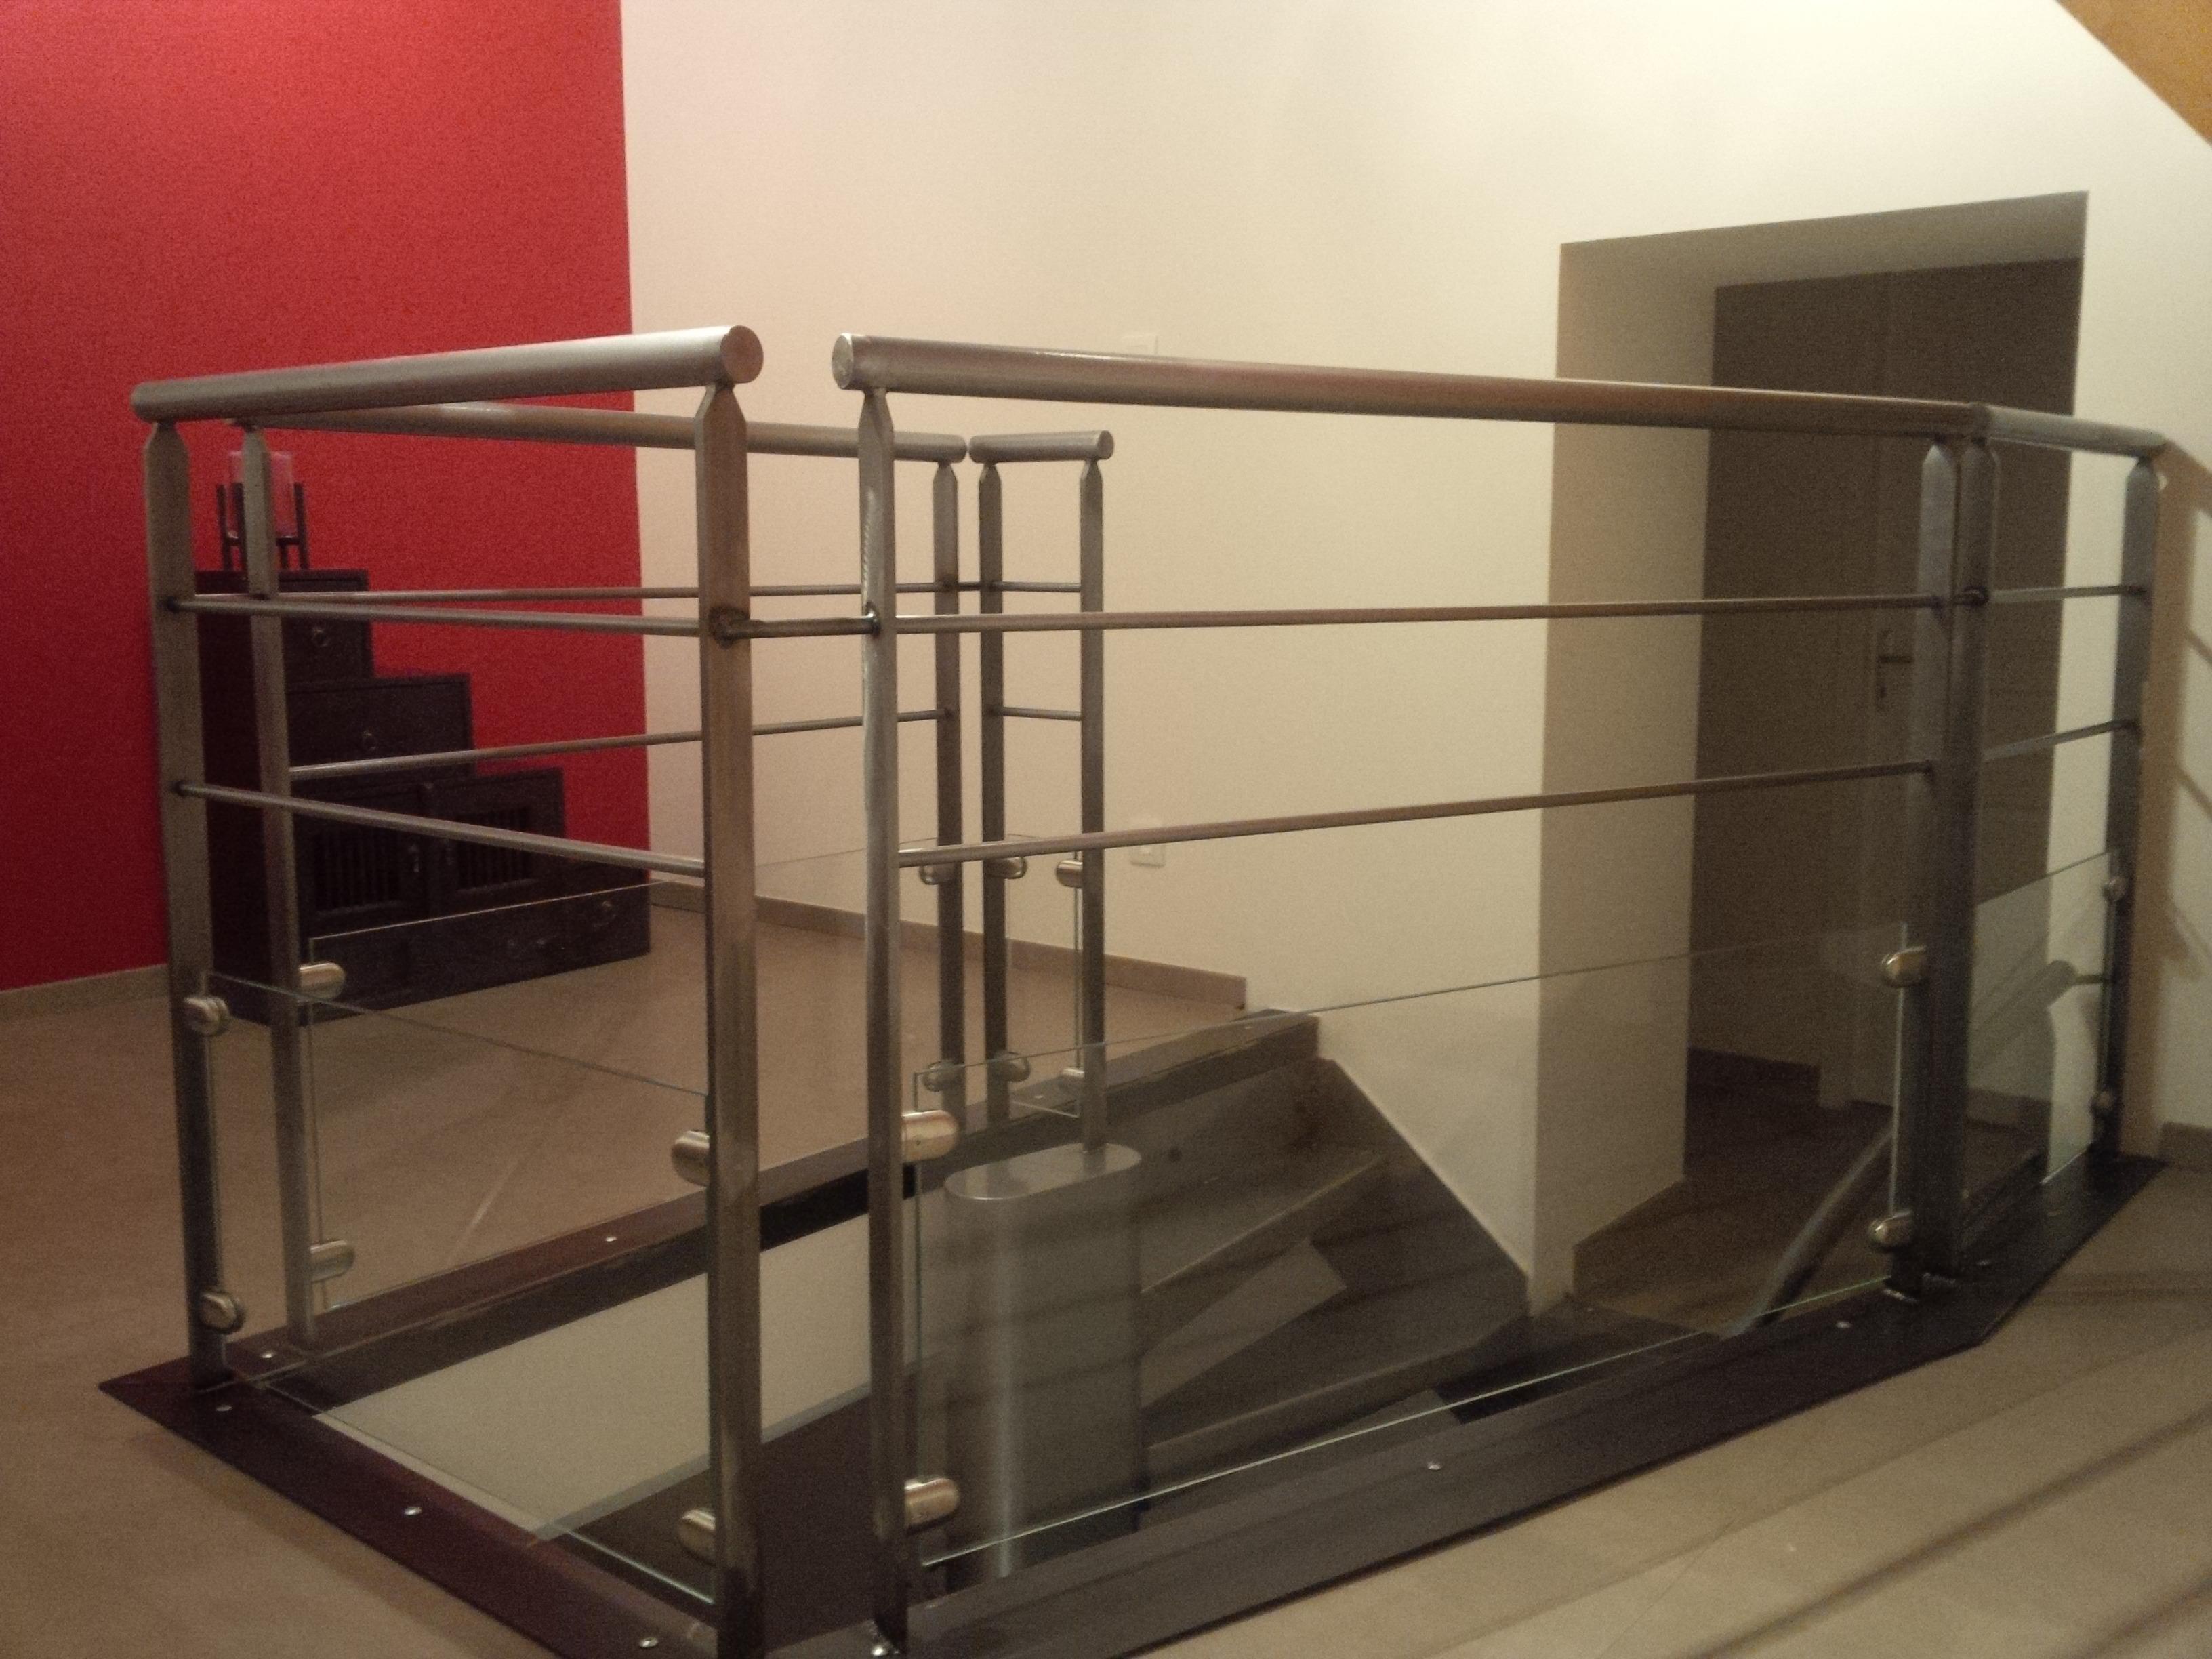 galerie de r alisation de garde corps int rieur. Black Bedroom Furniture Sets. Home Design Ideas